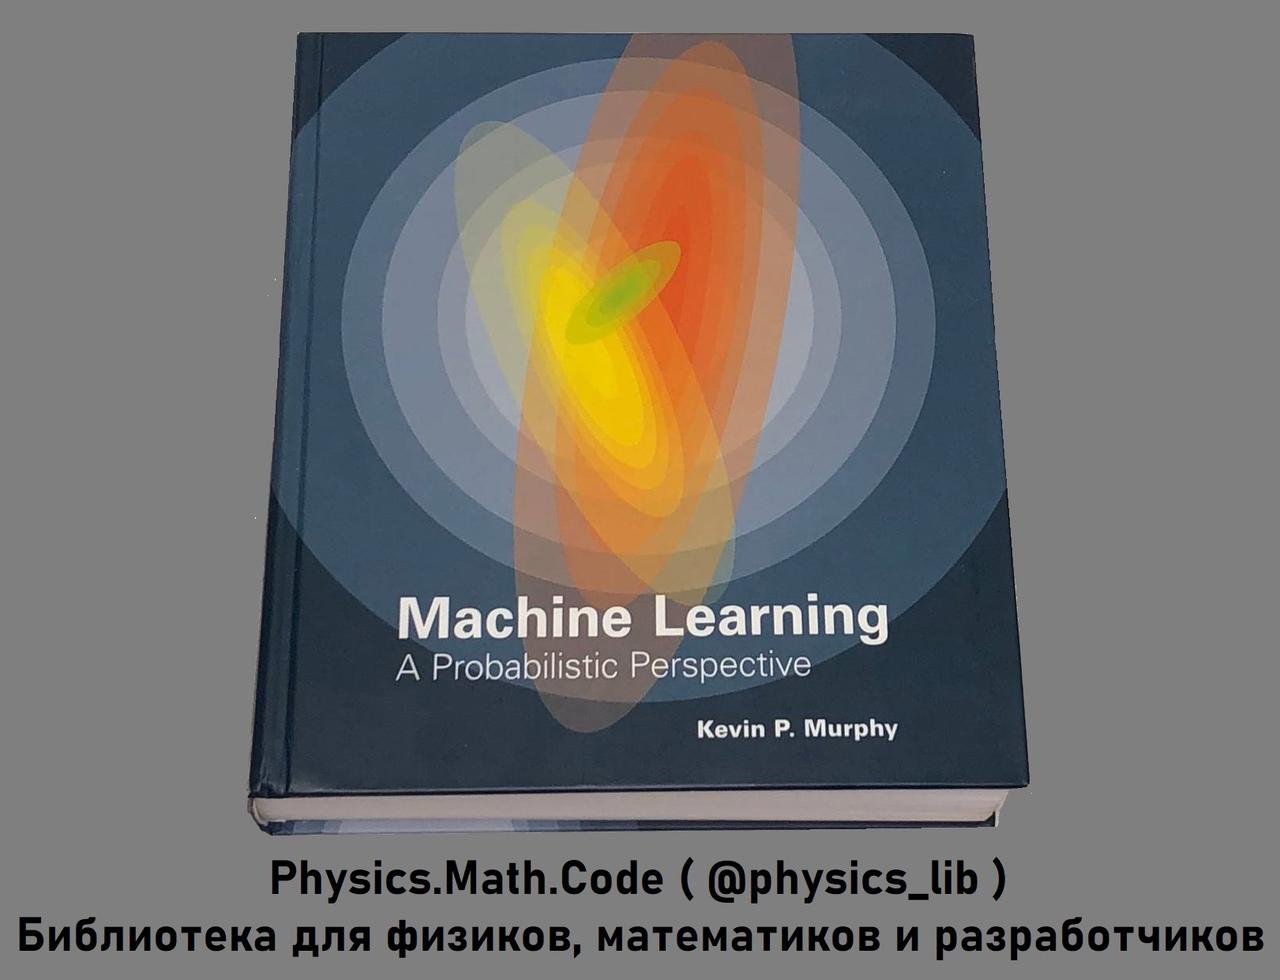 💾 Скачать книгу: https://t.me/physics_lib/7487